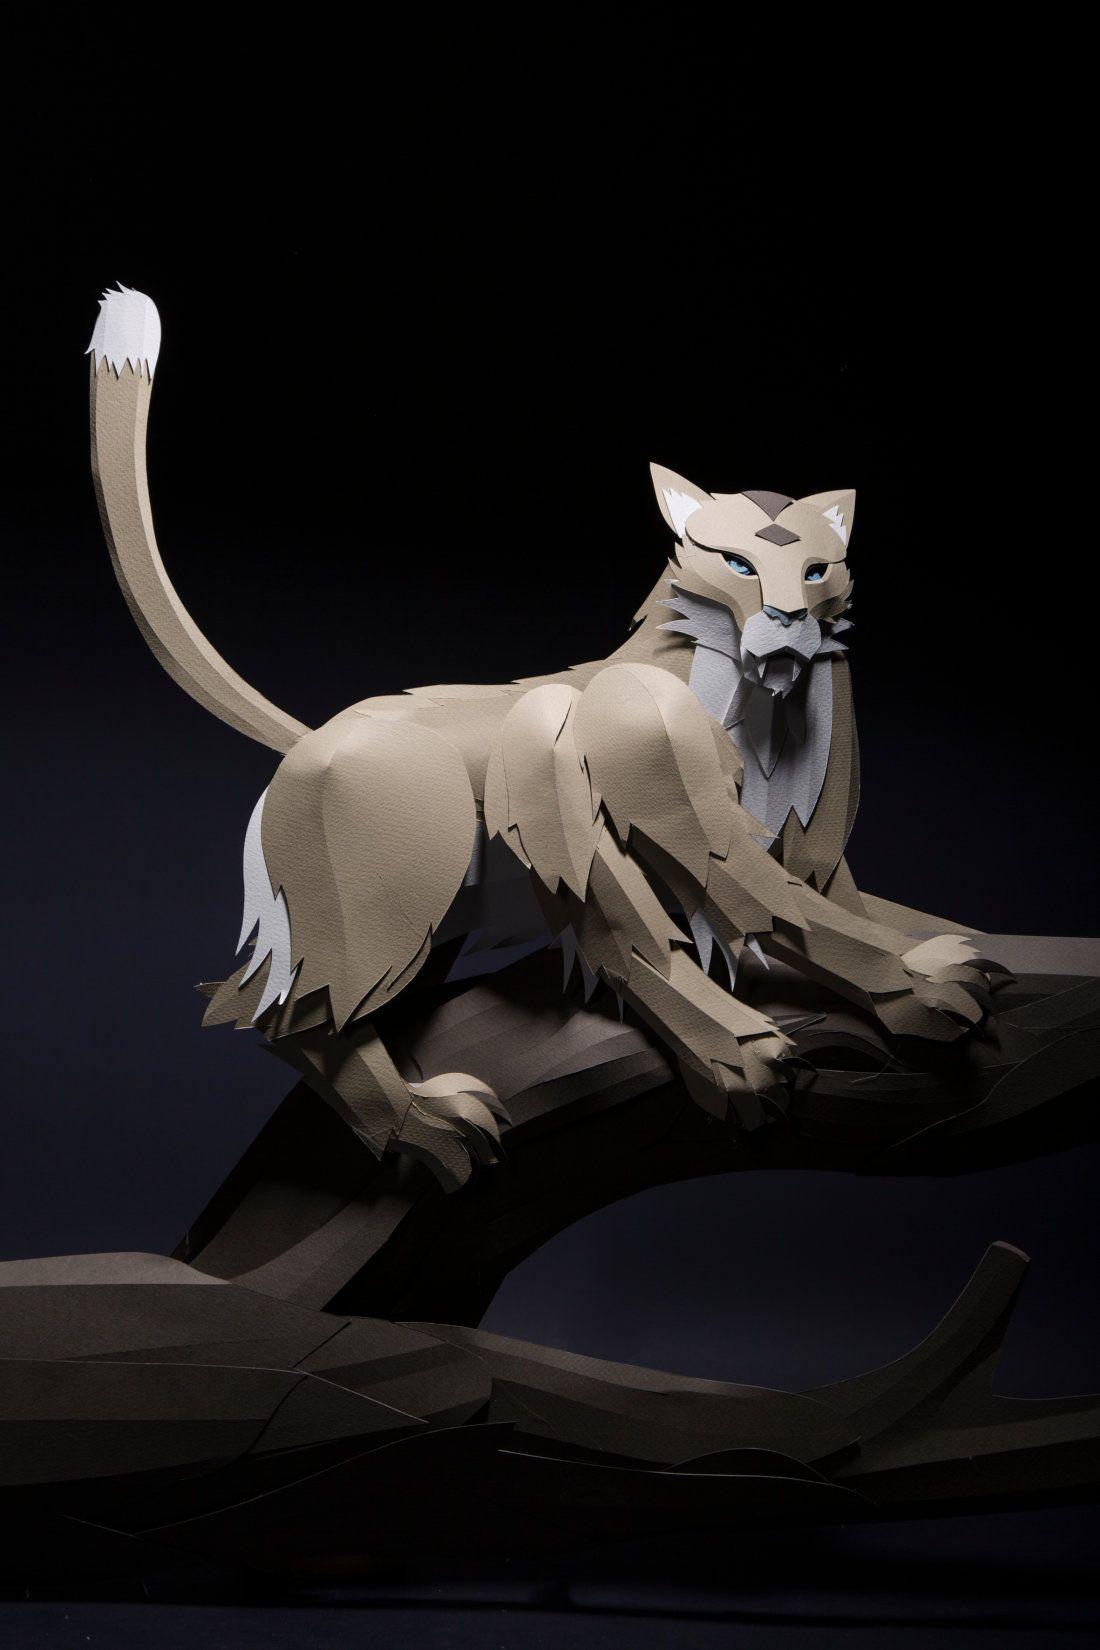 Fantastic Beasts Wampus Jpg 1100 1650 Magical Creatures Beast Creature Fantastic Beasts